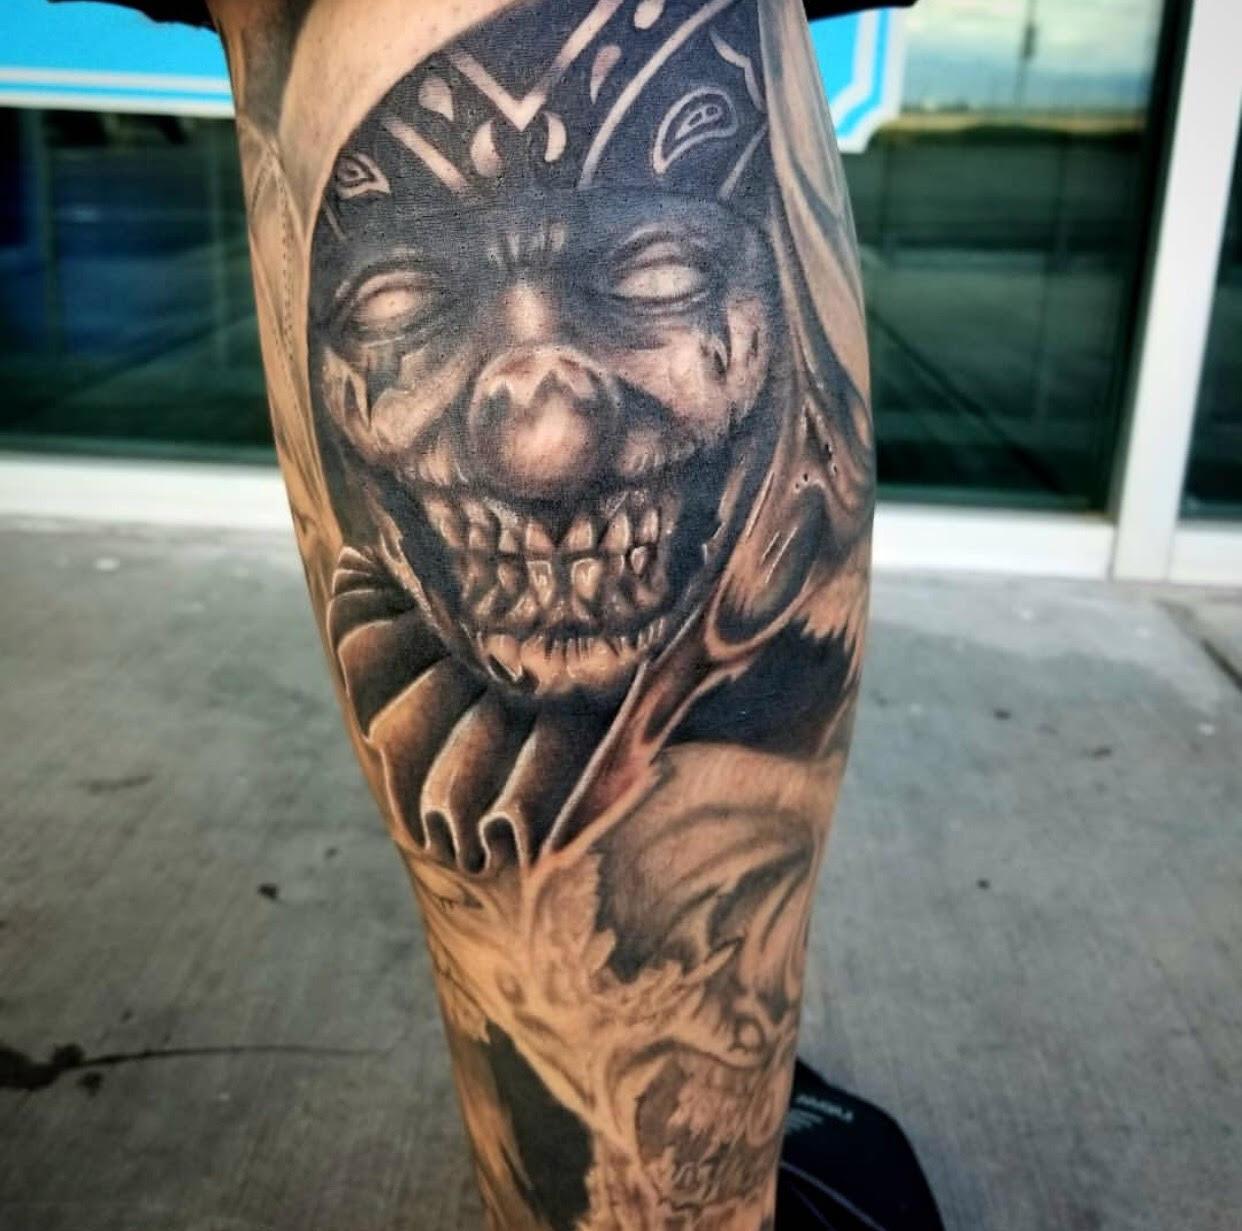 Creepy Clown tattoo by Eric